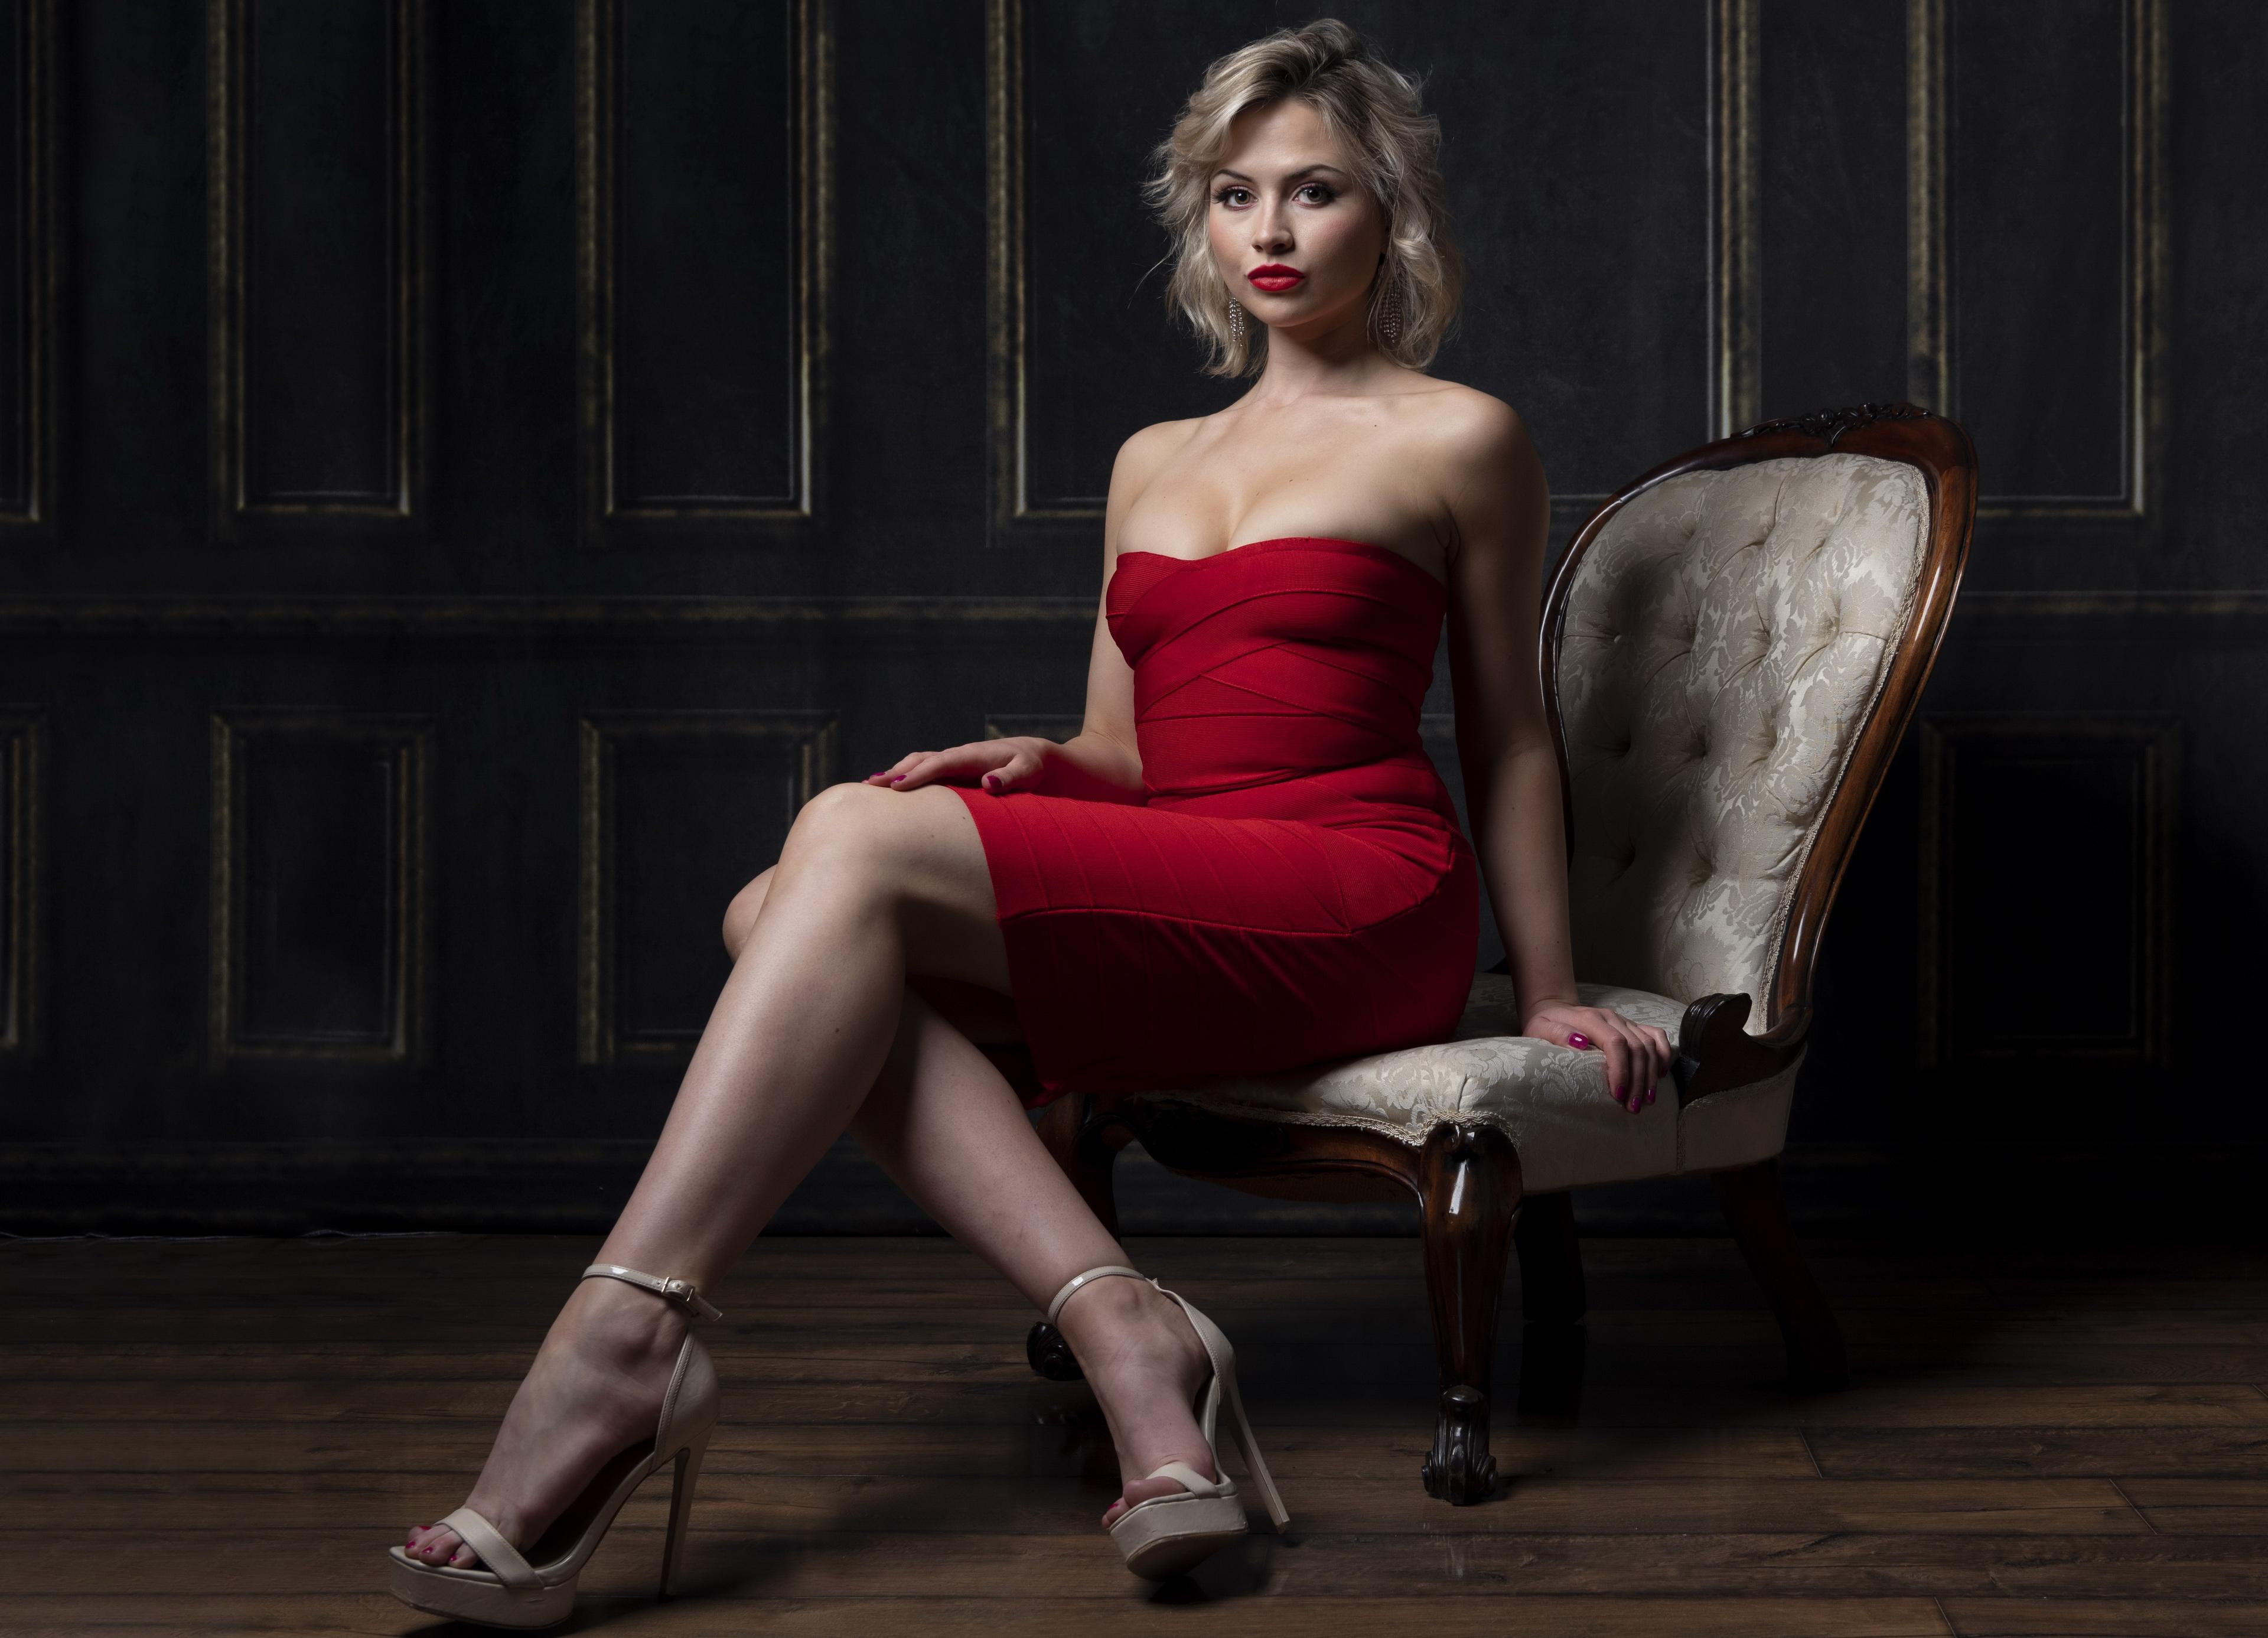 Model Women Blonde Dark Eyes Dress Red Dress Strapless Dress Lipstick Red Lipstick Bare Shoulders Le 3840x2773